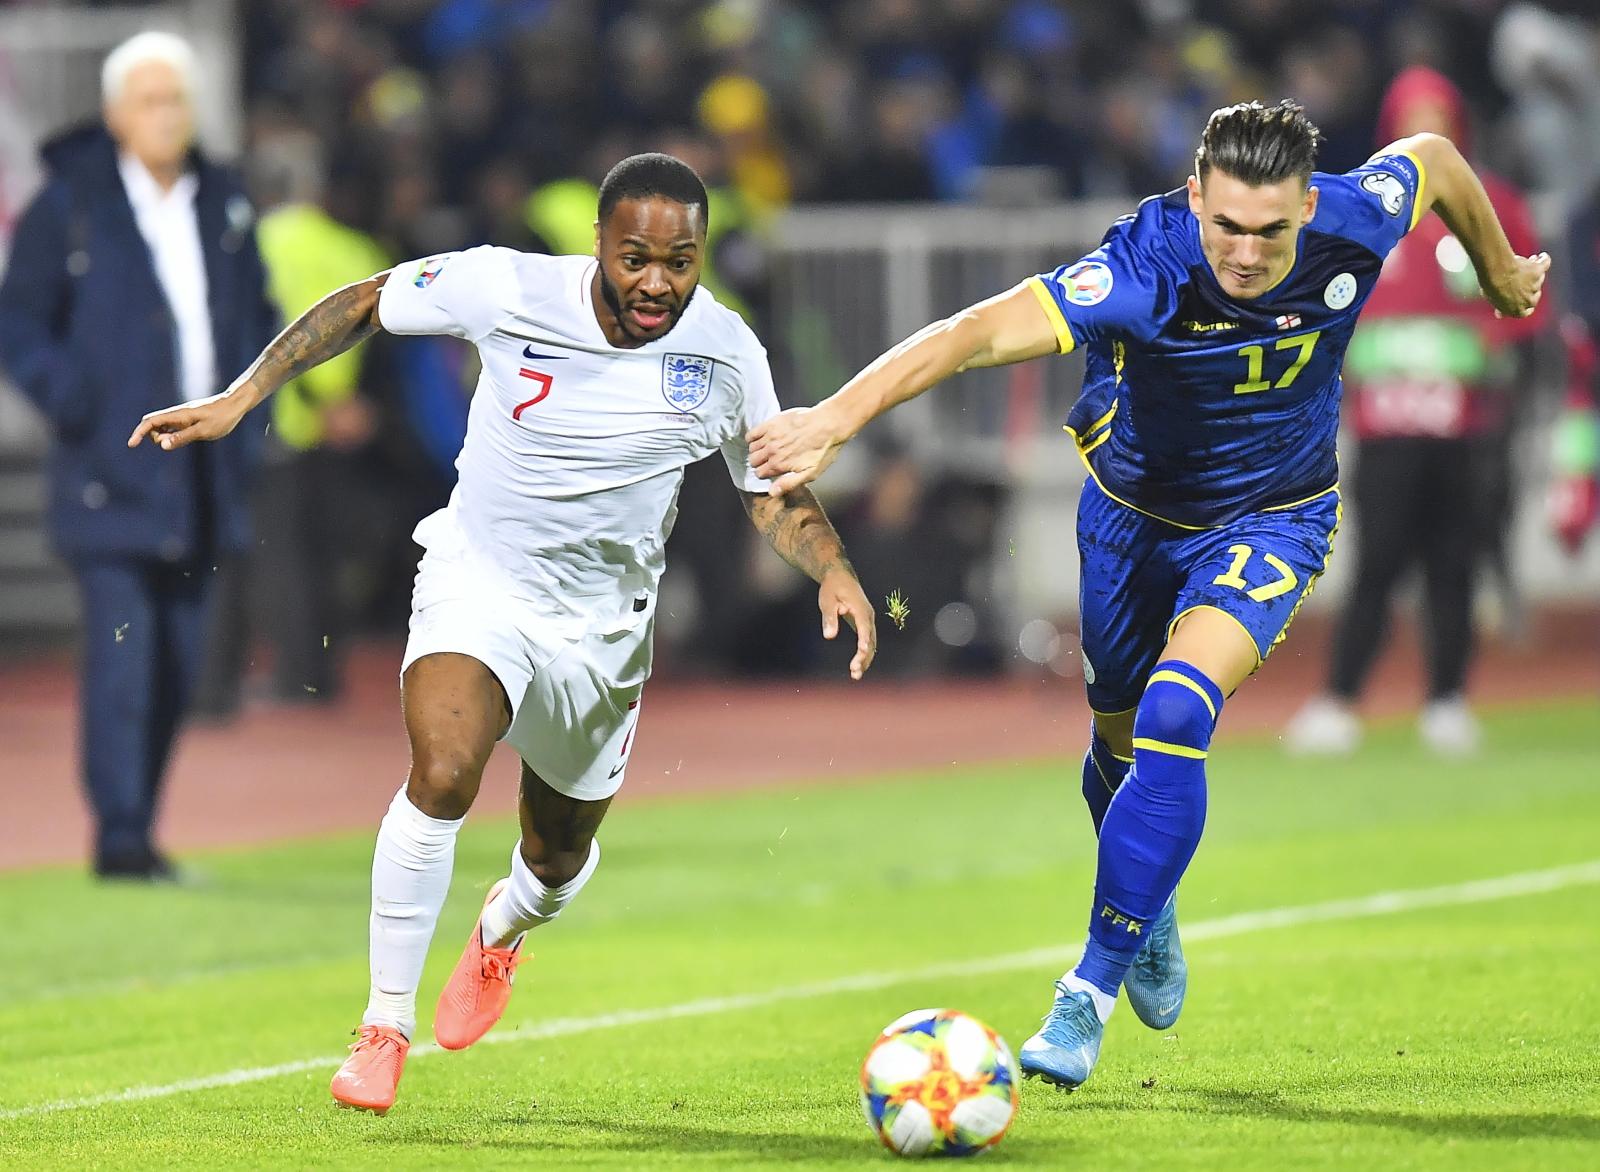 Mecz piłki nożnej - Kosowo vs Anglia  EPA/GEORGI LICOVSKI